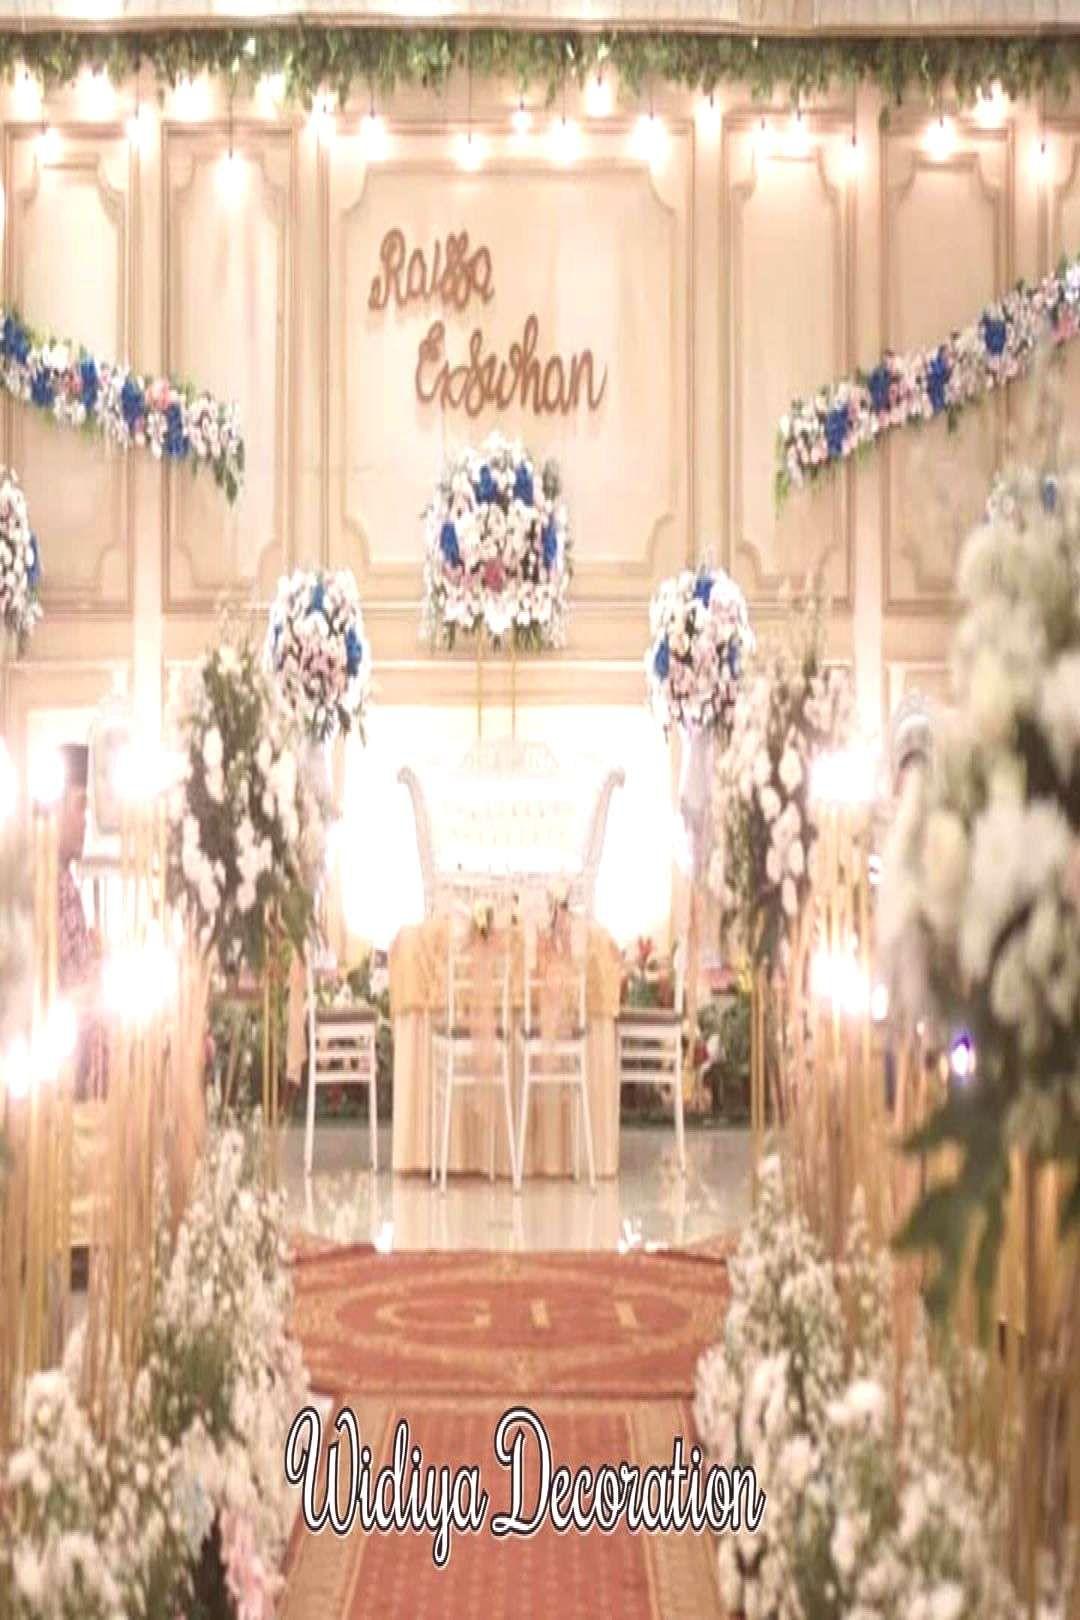 #pelaminan #minimalis #contact #modern #widiya #indoor #dhika #table #0816 #1126 #477 #and #us PELAMINAN MINIMALIS MODERN CONTACT US WIDIYA 0816 1126 477 DHIKA You can find Rustic wedding and more on our website.PELA...